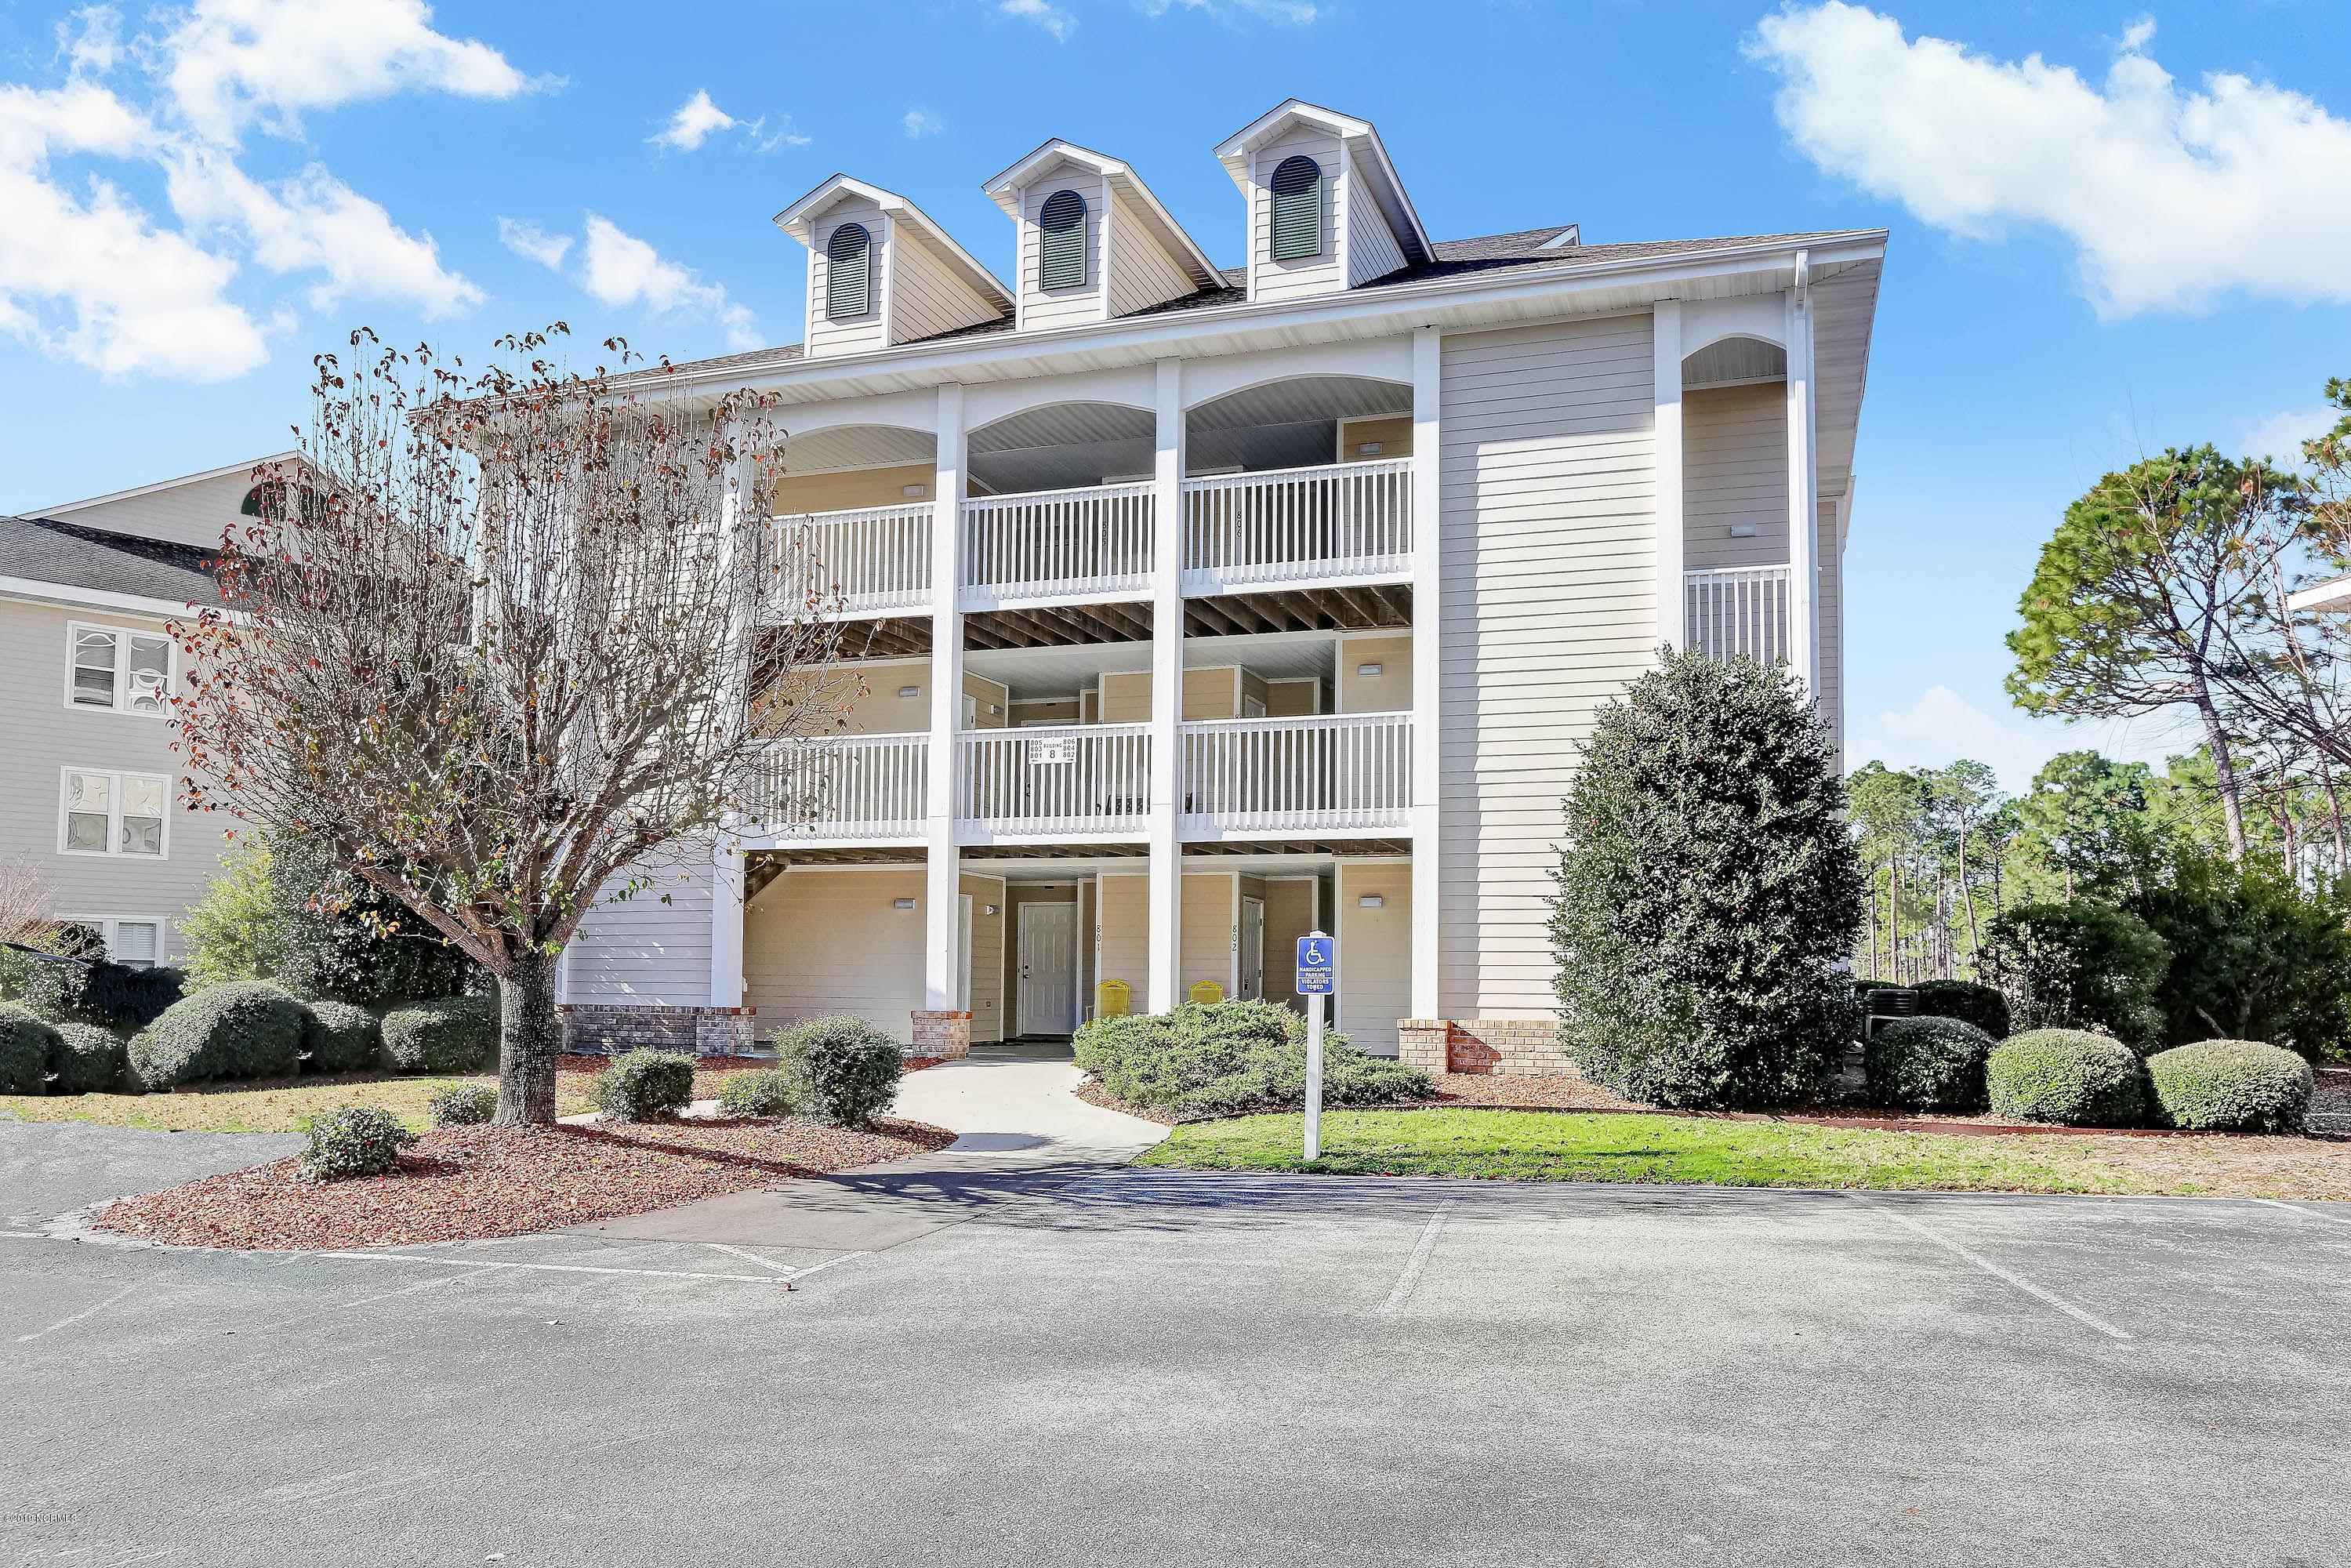 Carolina Plantations Real Estate - MLS Number: 100145711